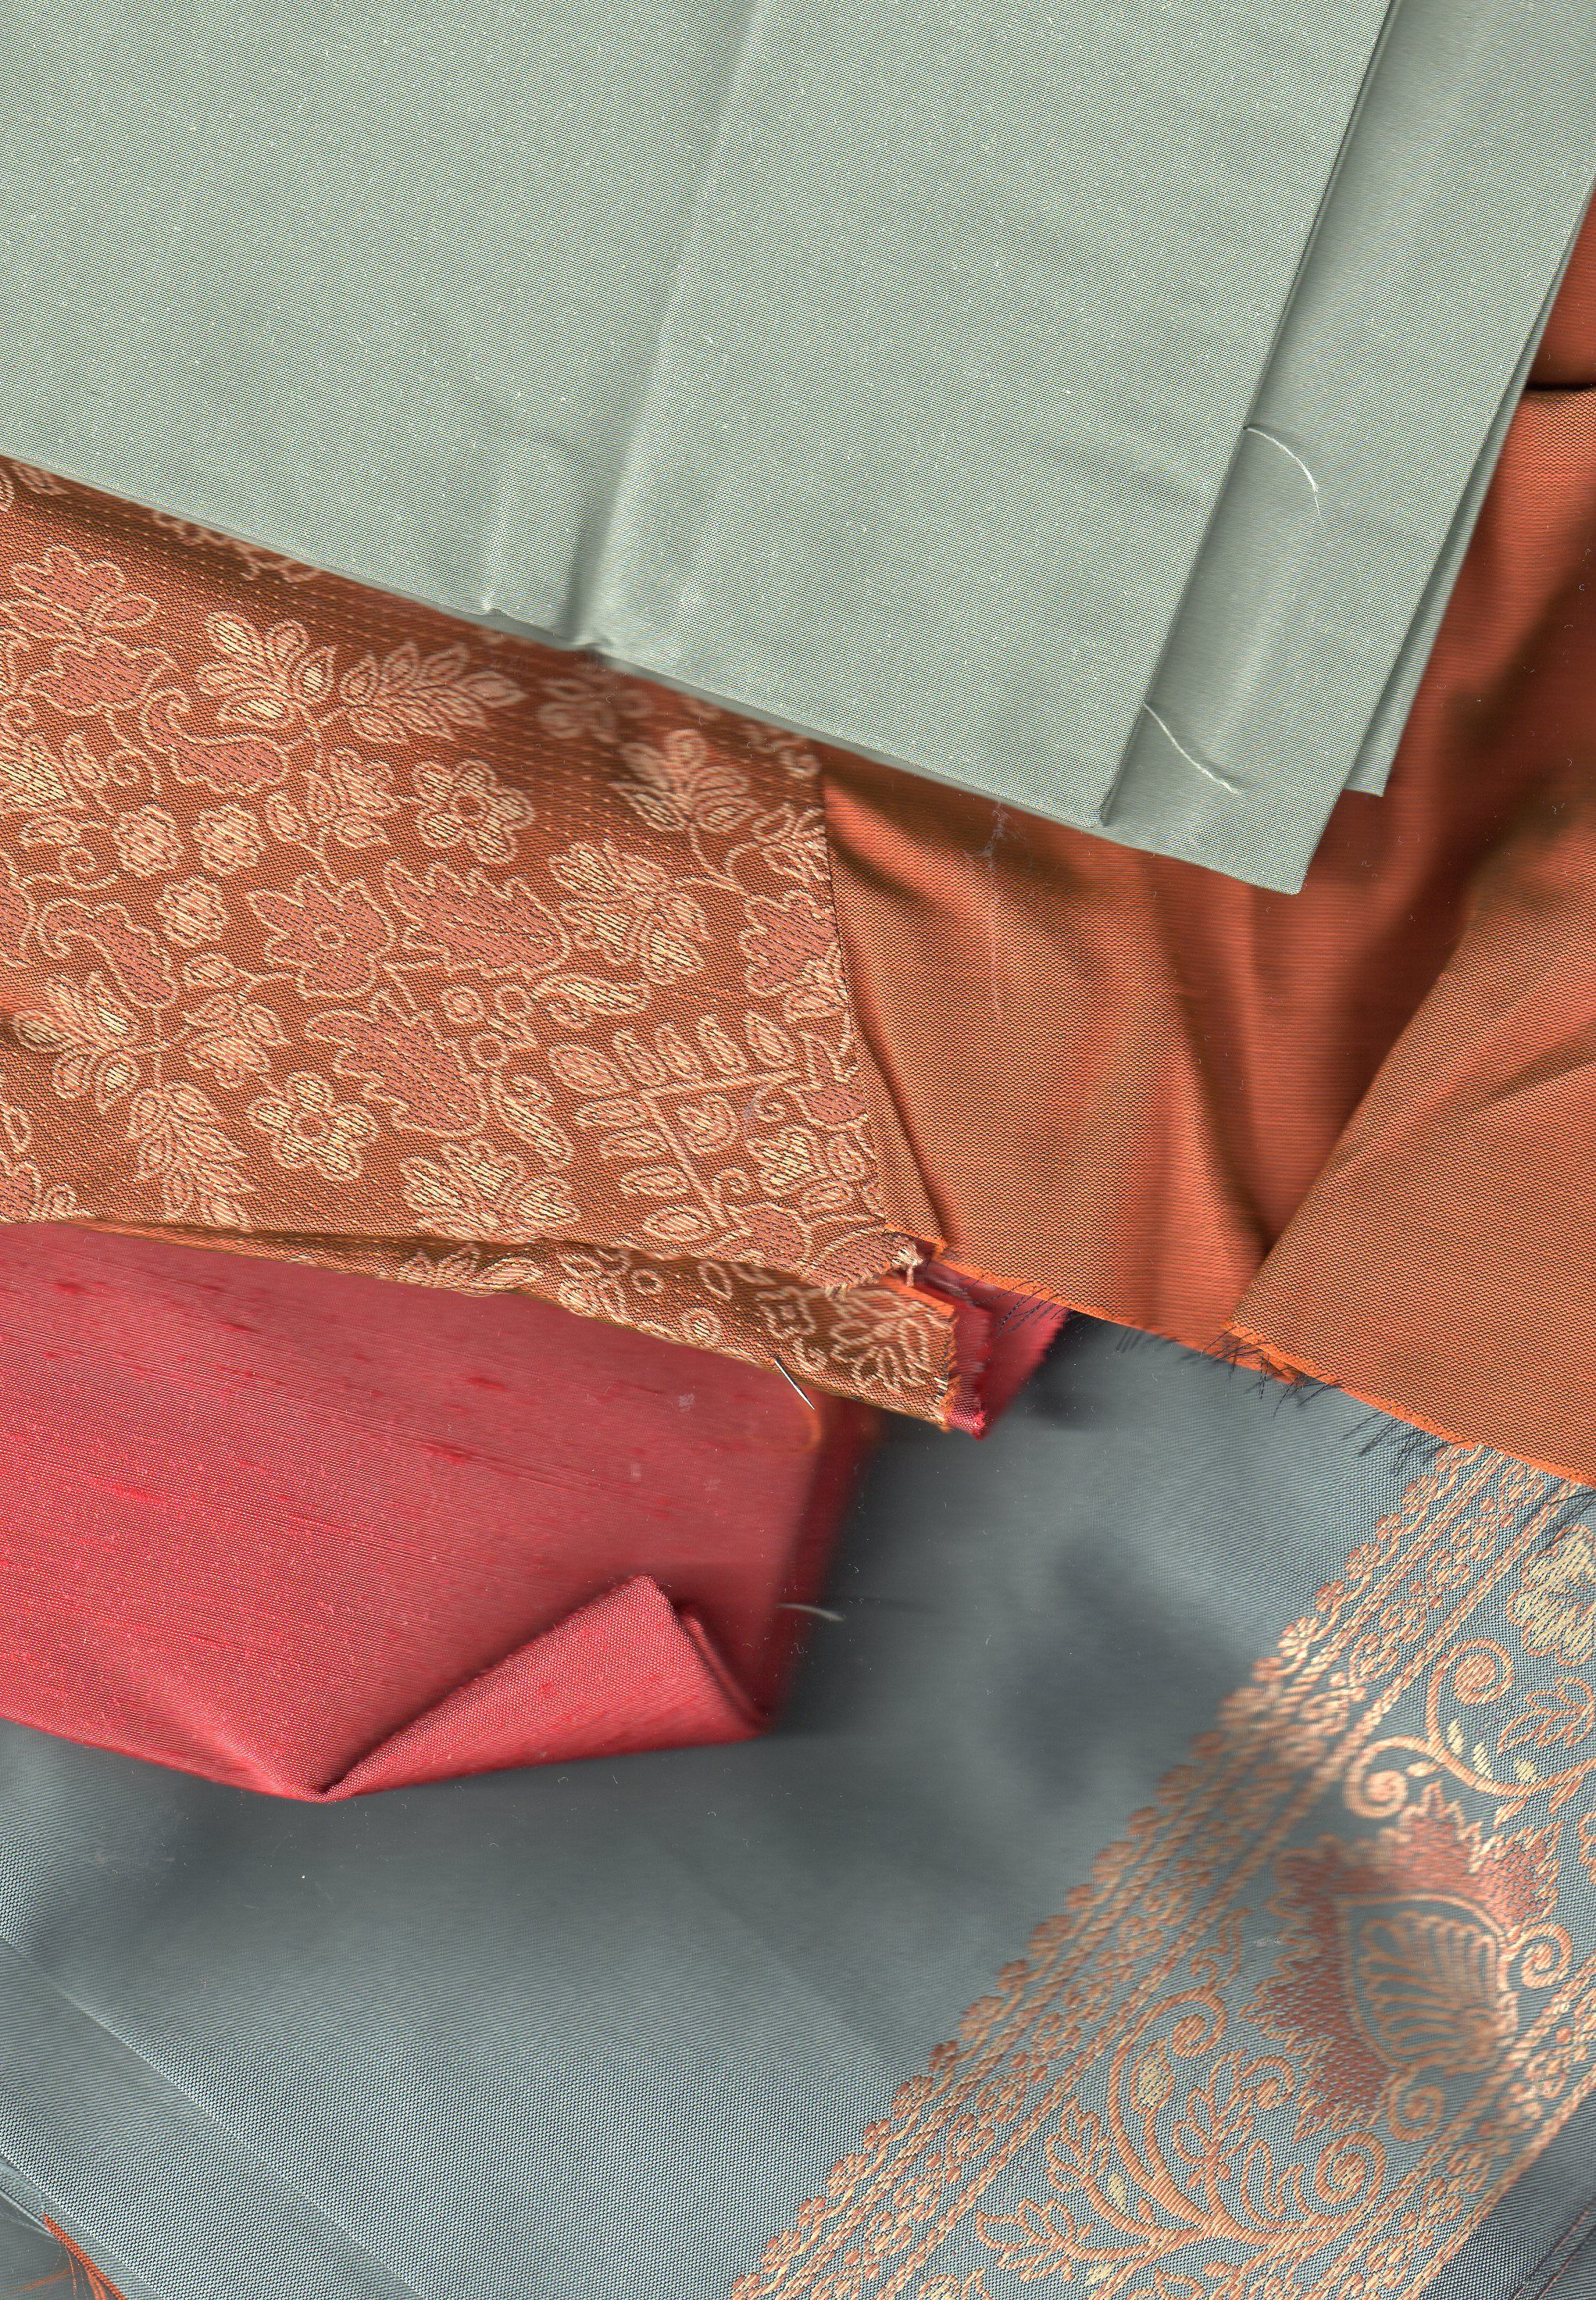 BIN REMAKES Silk sari, Jaipor, cut with matching Thai and Dupion silks